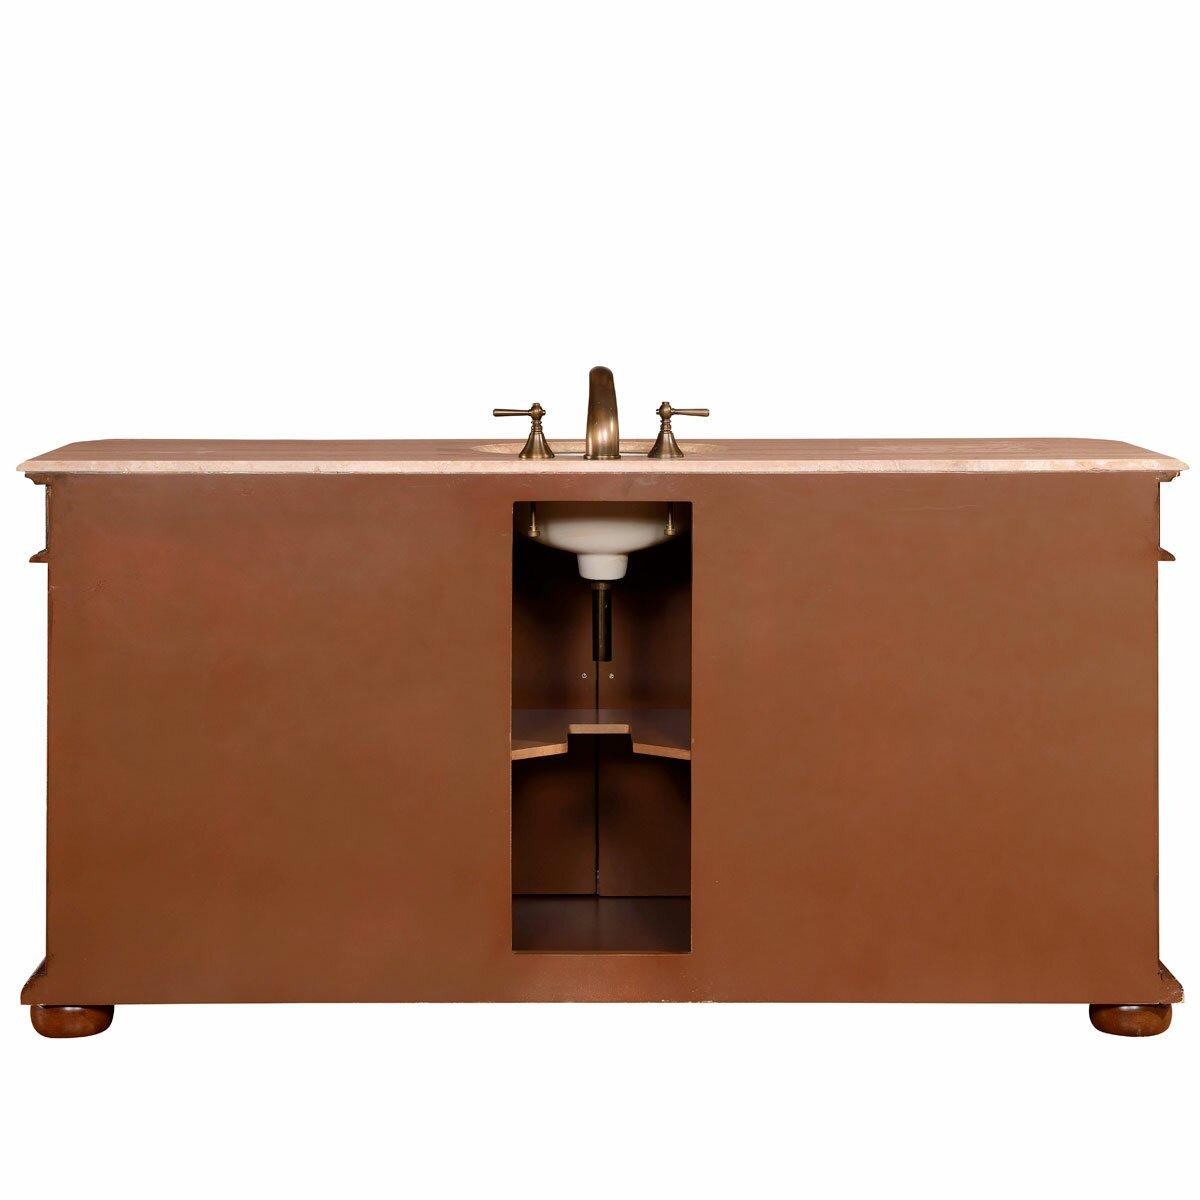 72 single sink cabinet bathroom vanity set wayfair. Black Bedroom Furniture Sets. Home Design Ideas